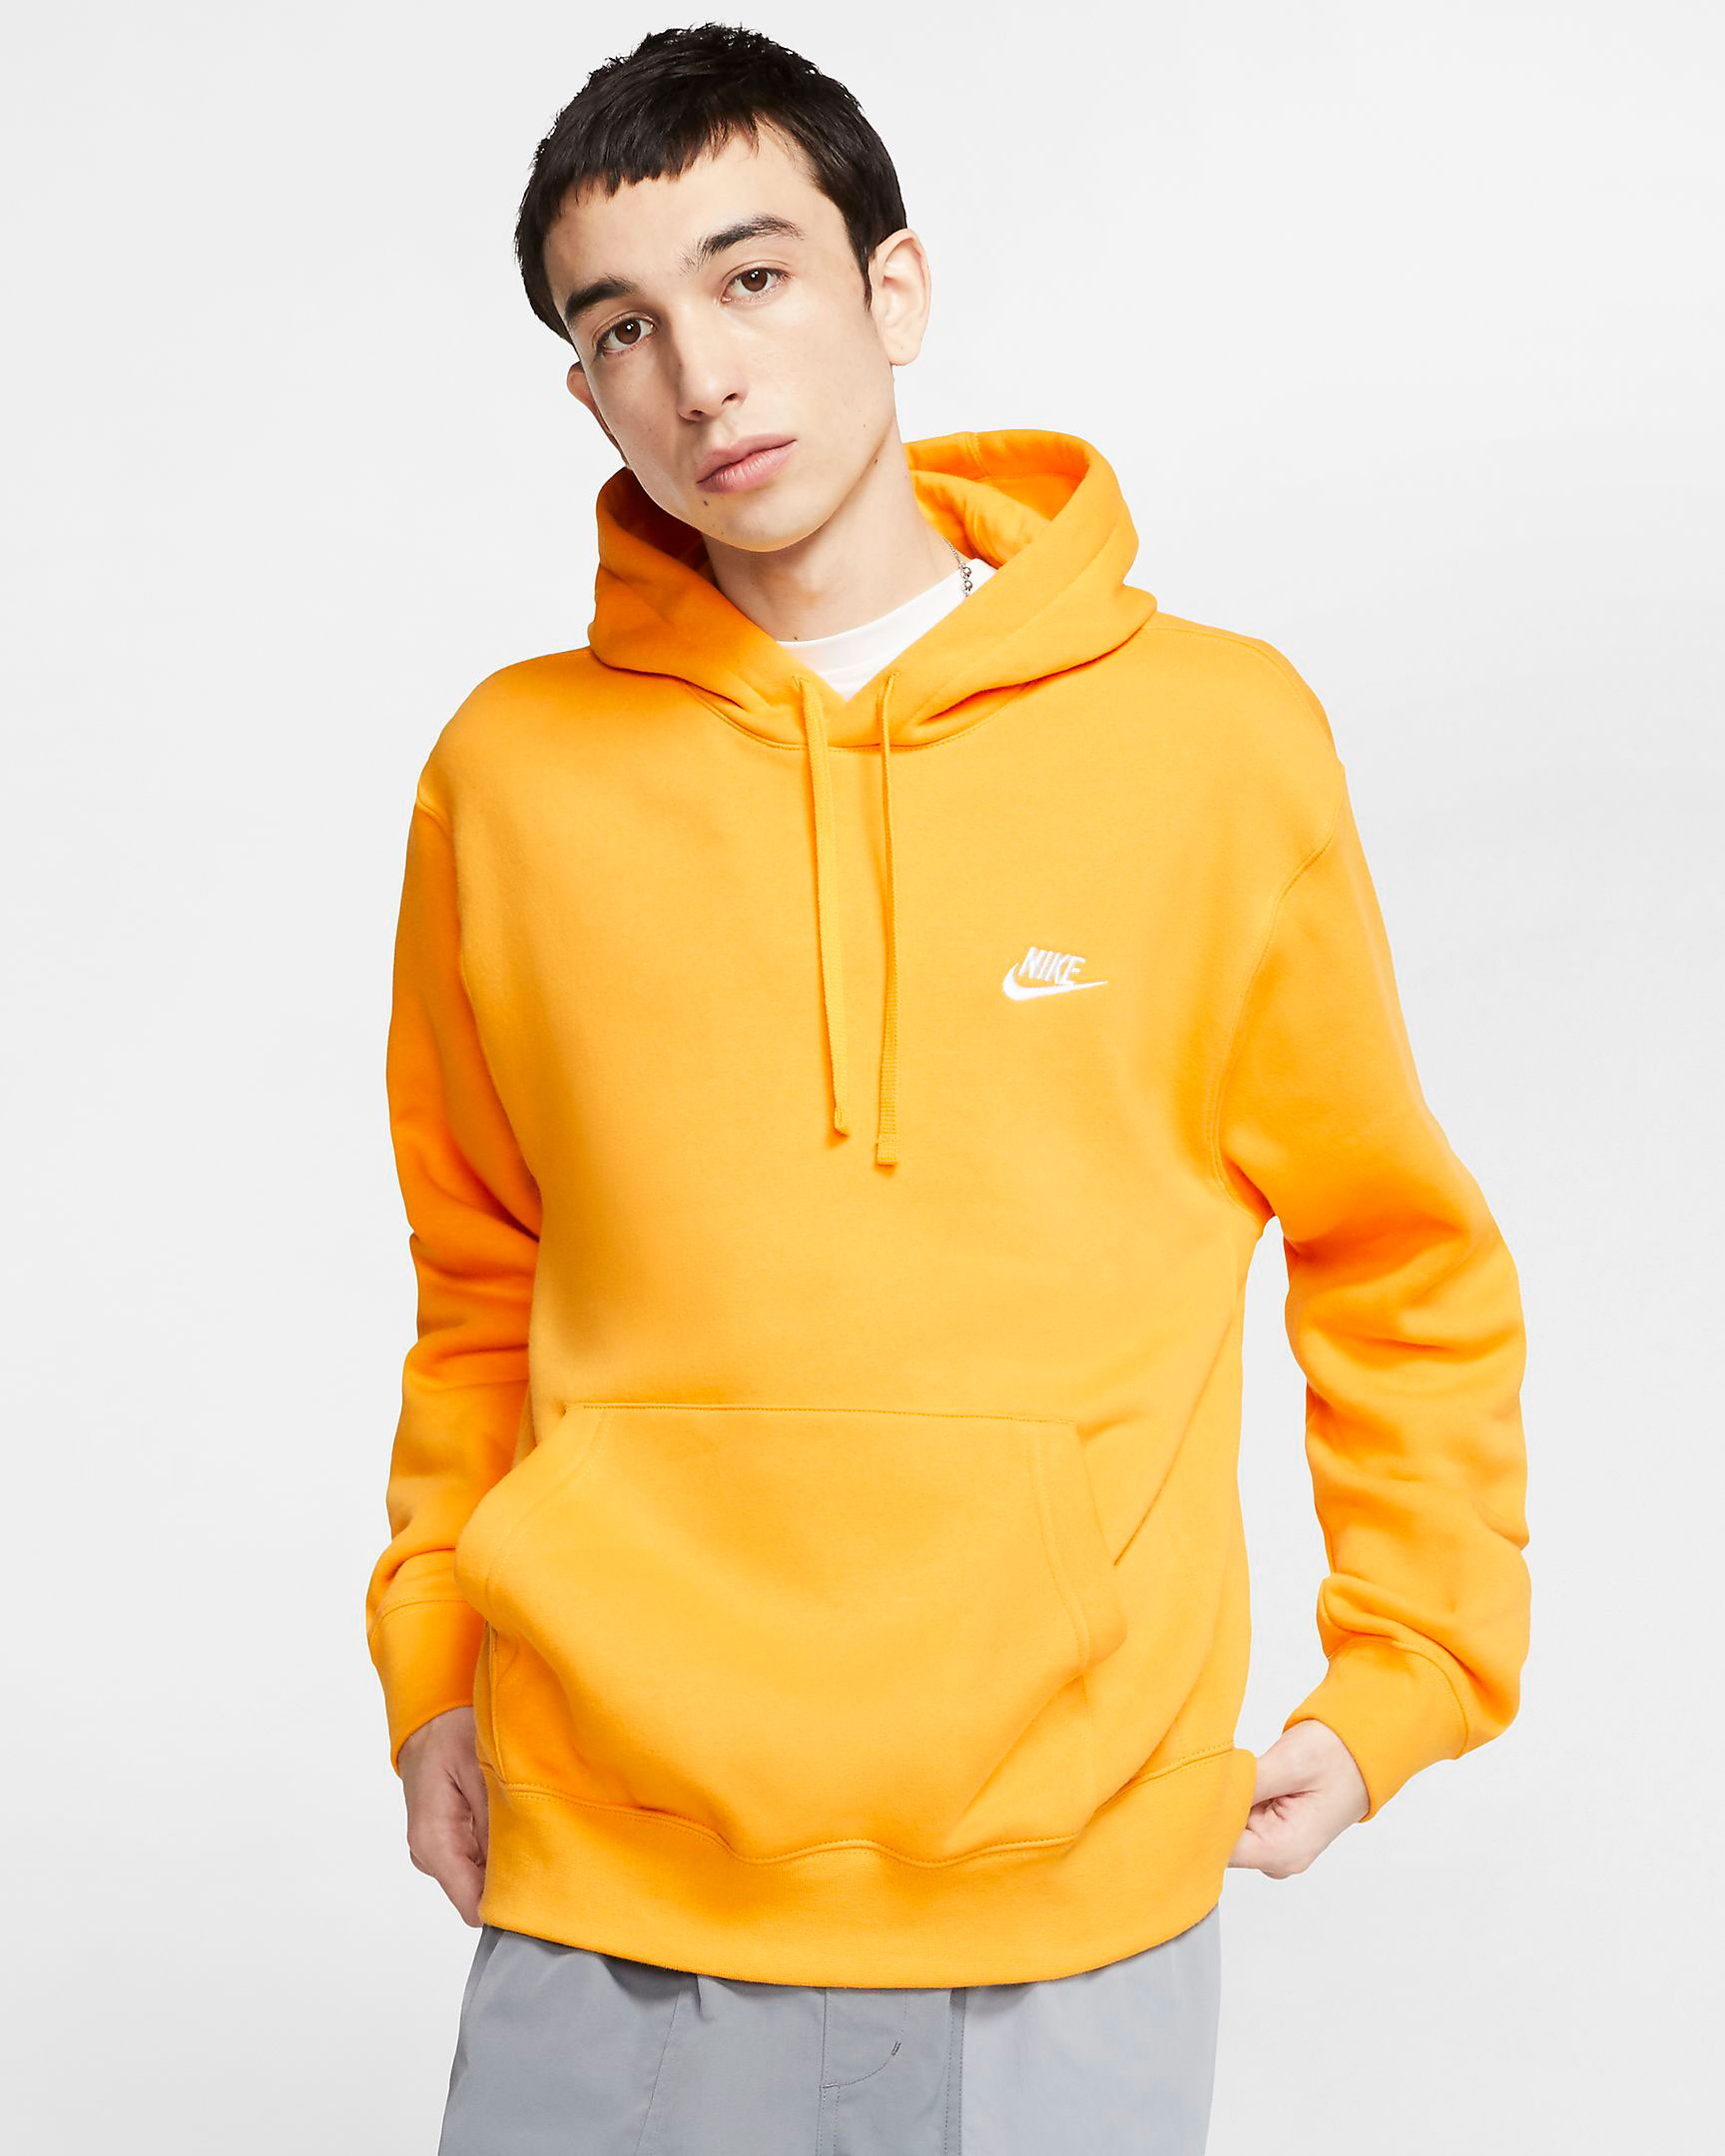 jordan-1-bio-hack-nike-hoodie-match-orange